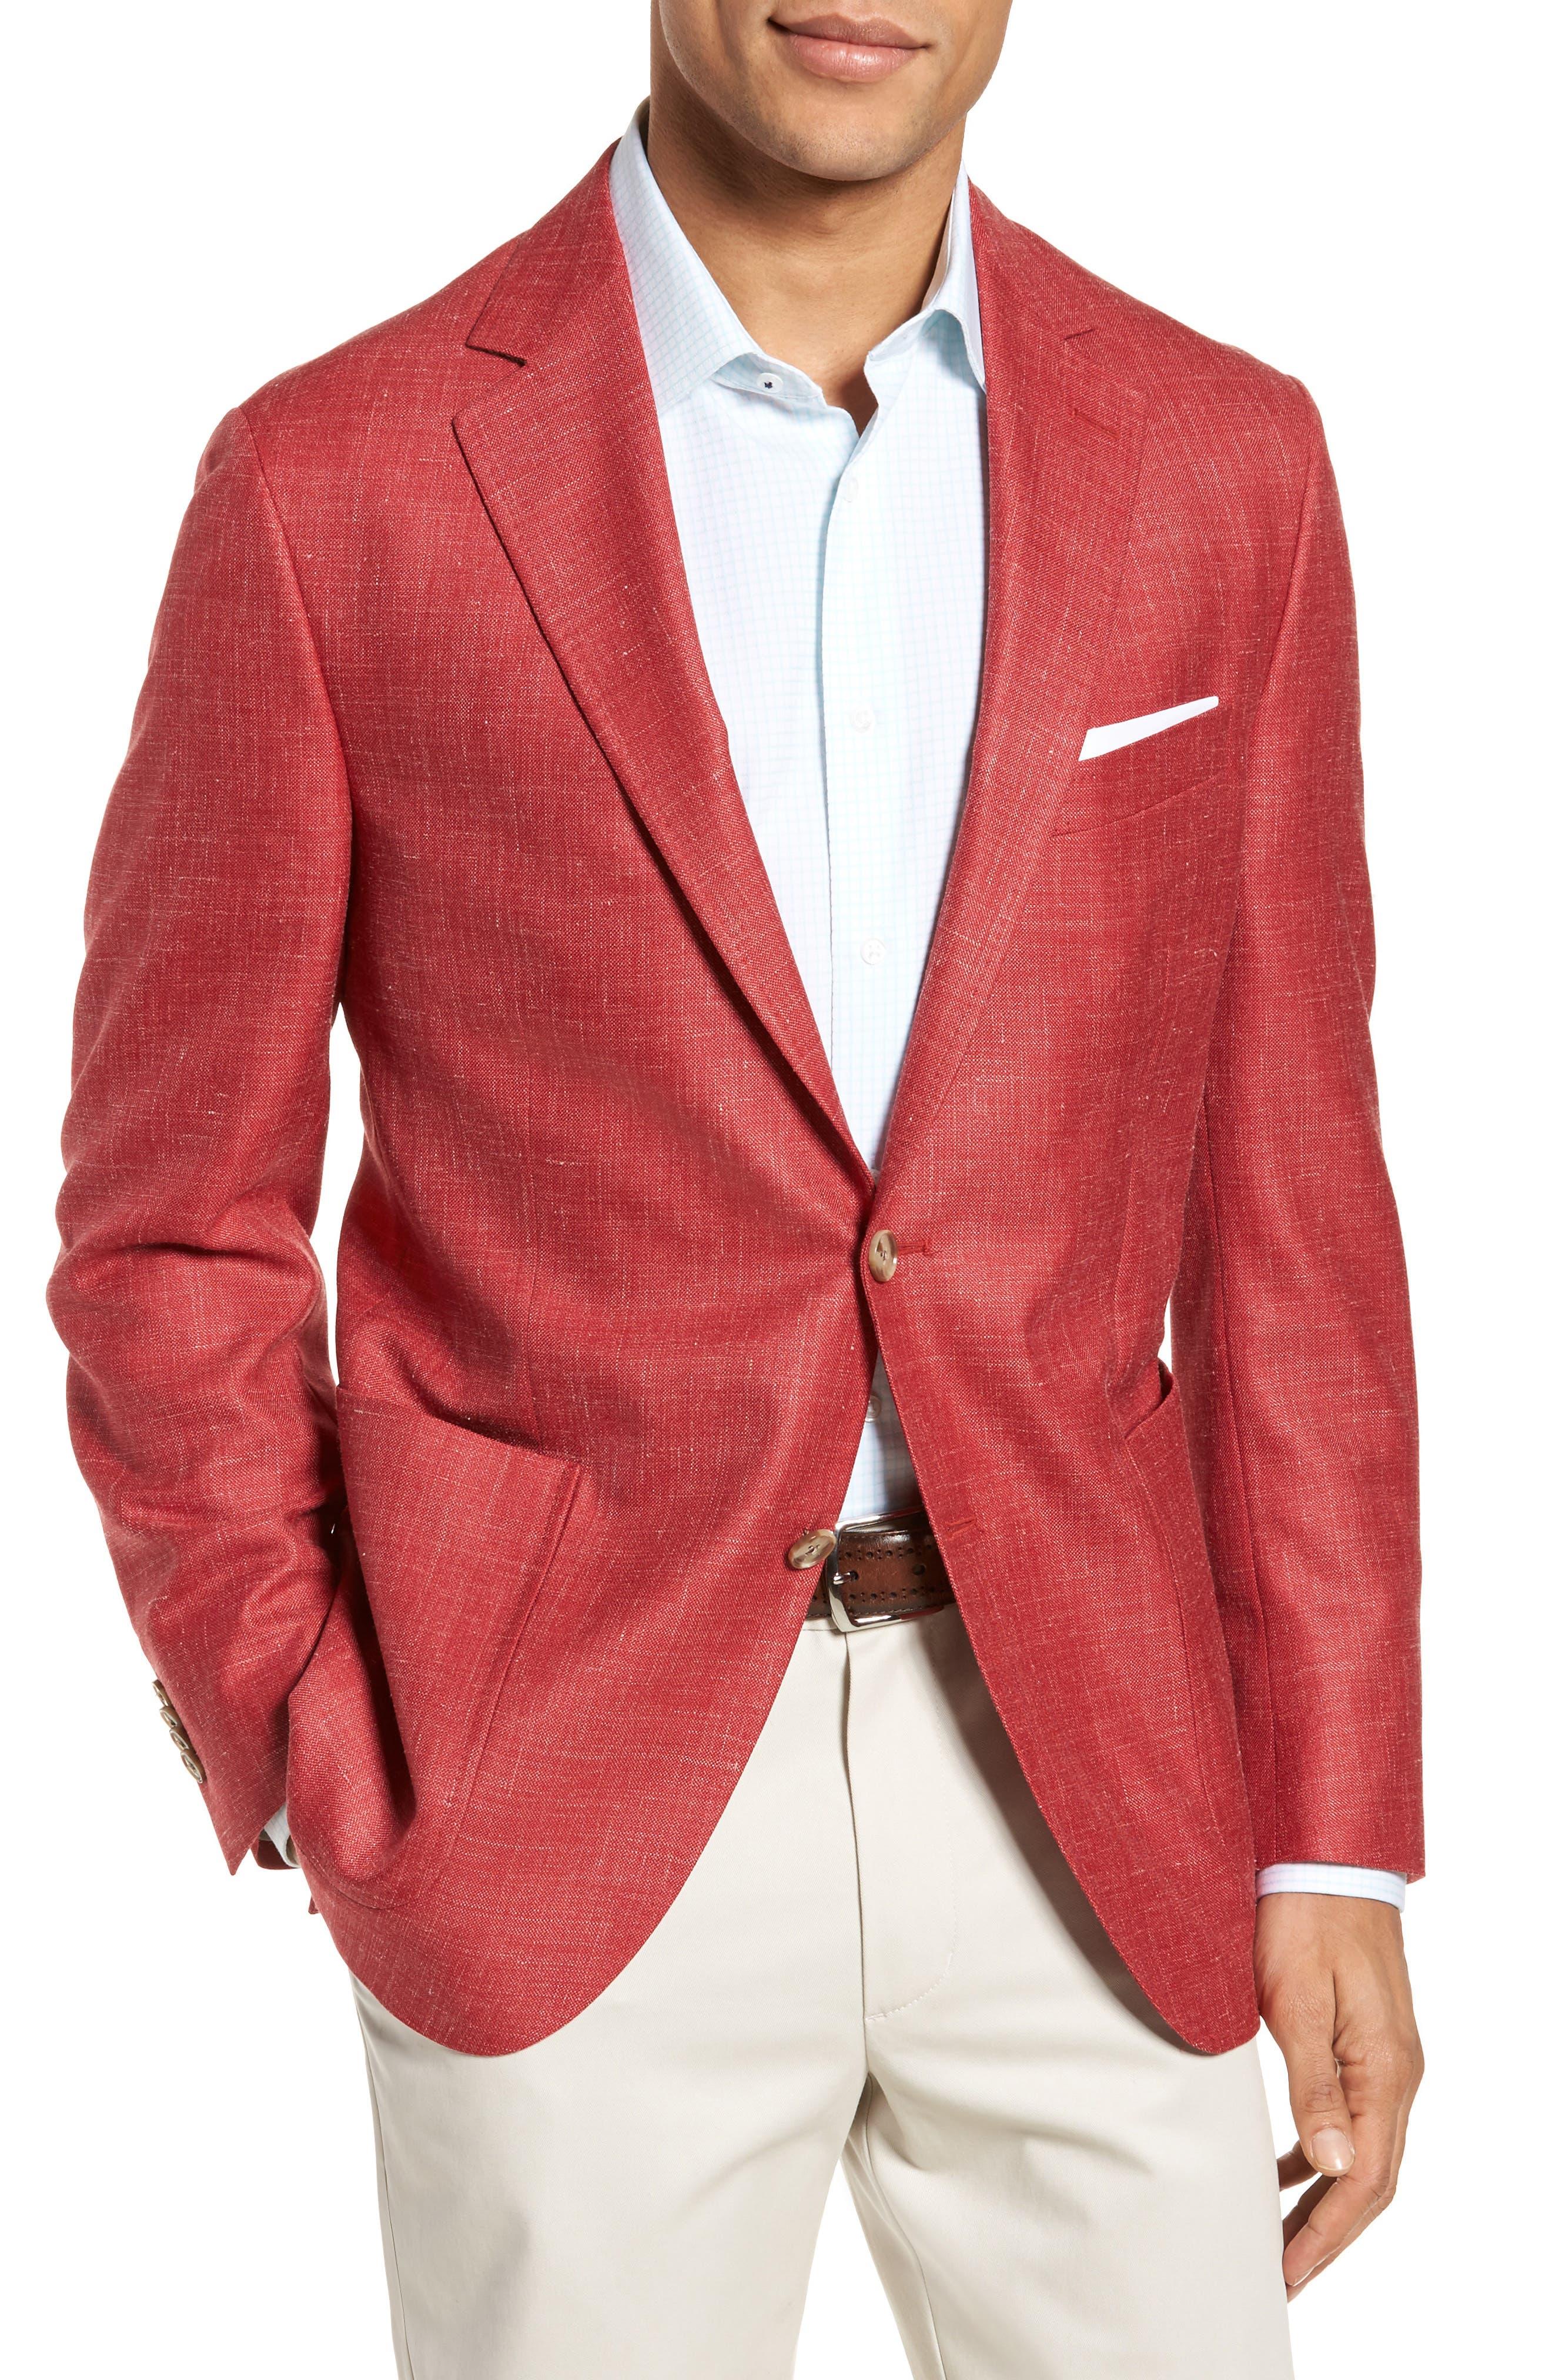 Main Image - Peter Millar Classic Fit Wool Blend Blazer